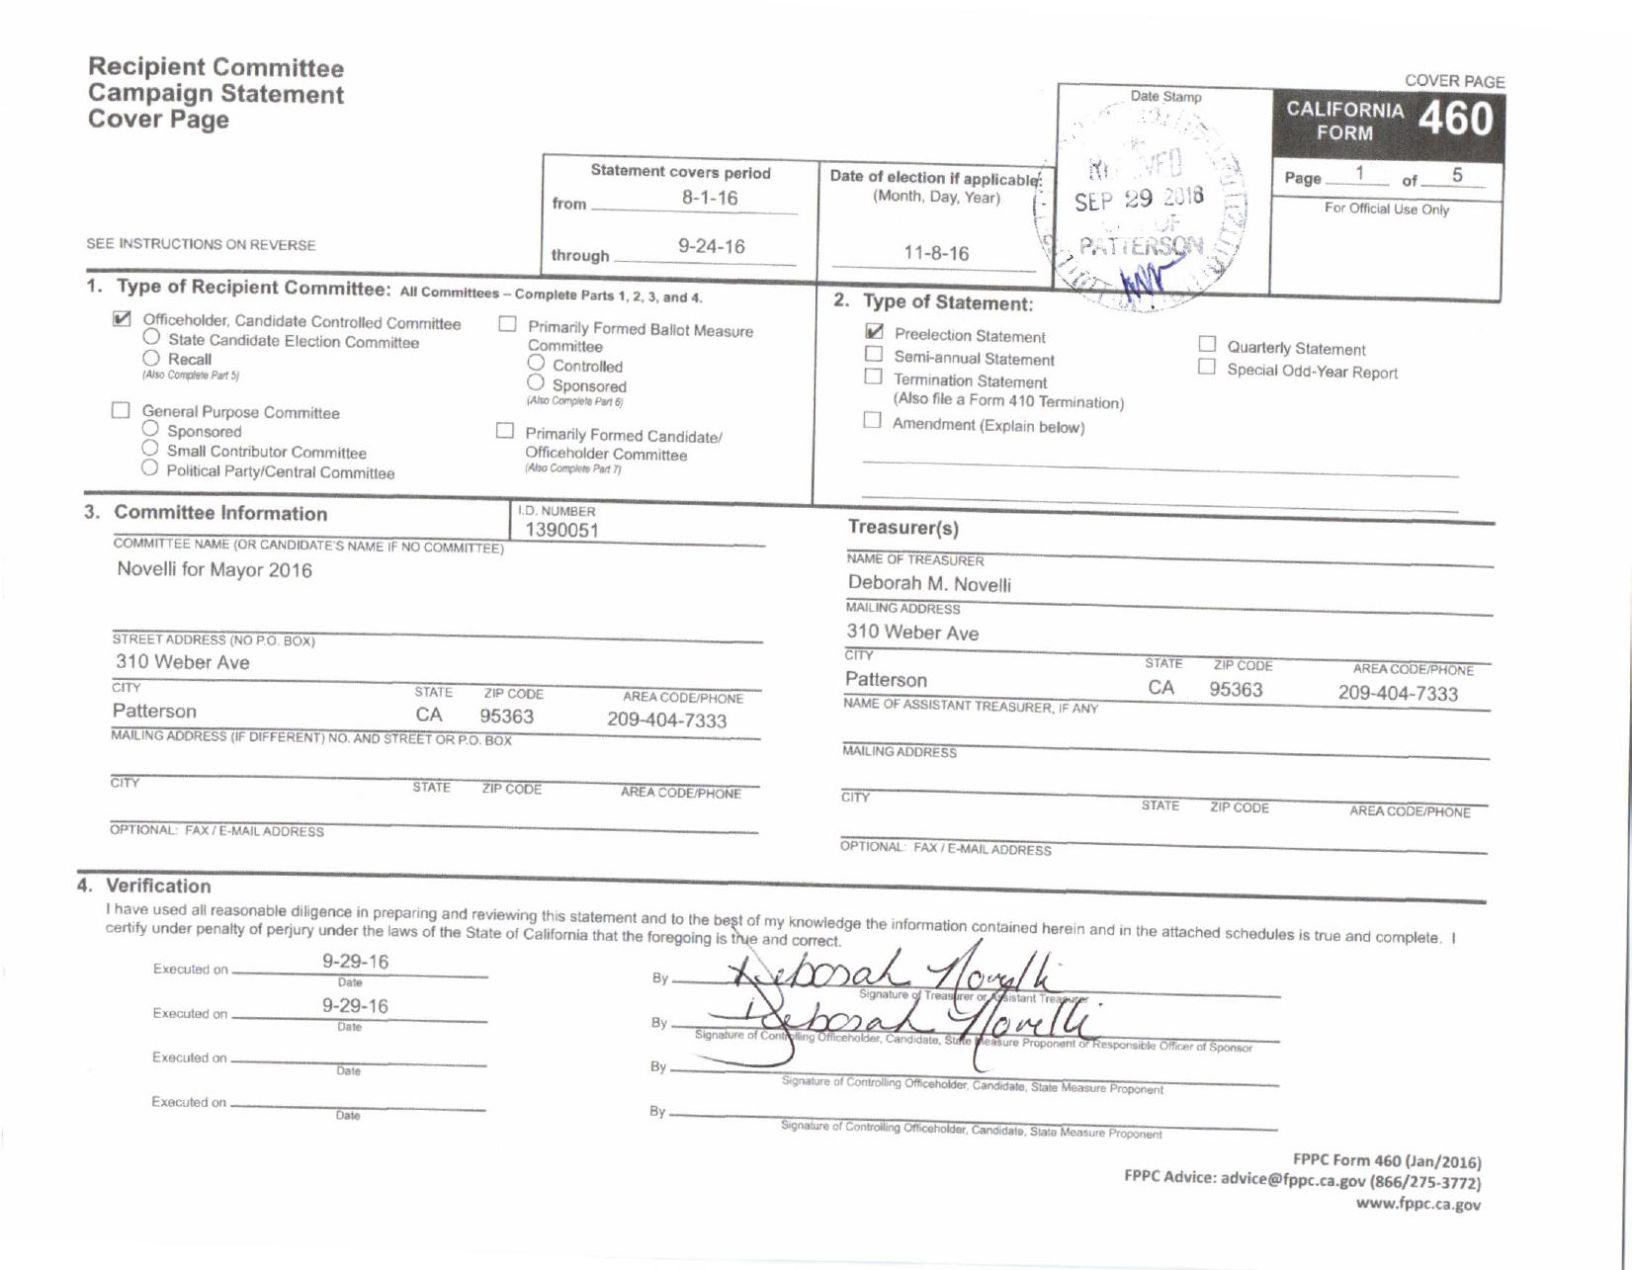 Deborah Novelli – Form 460: September 2016 - Golden State ...